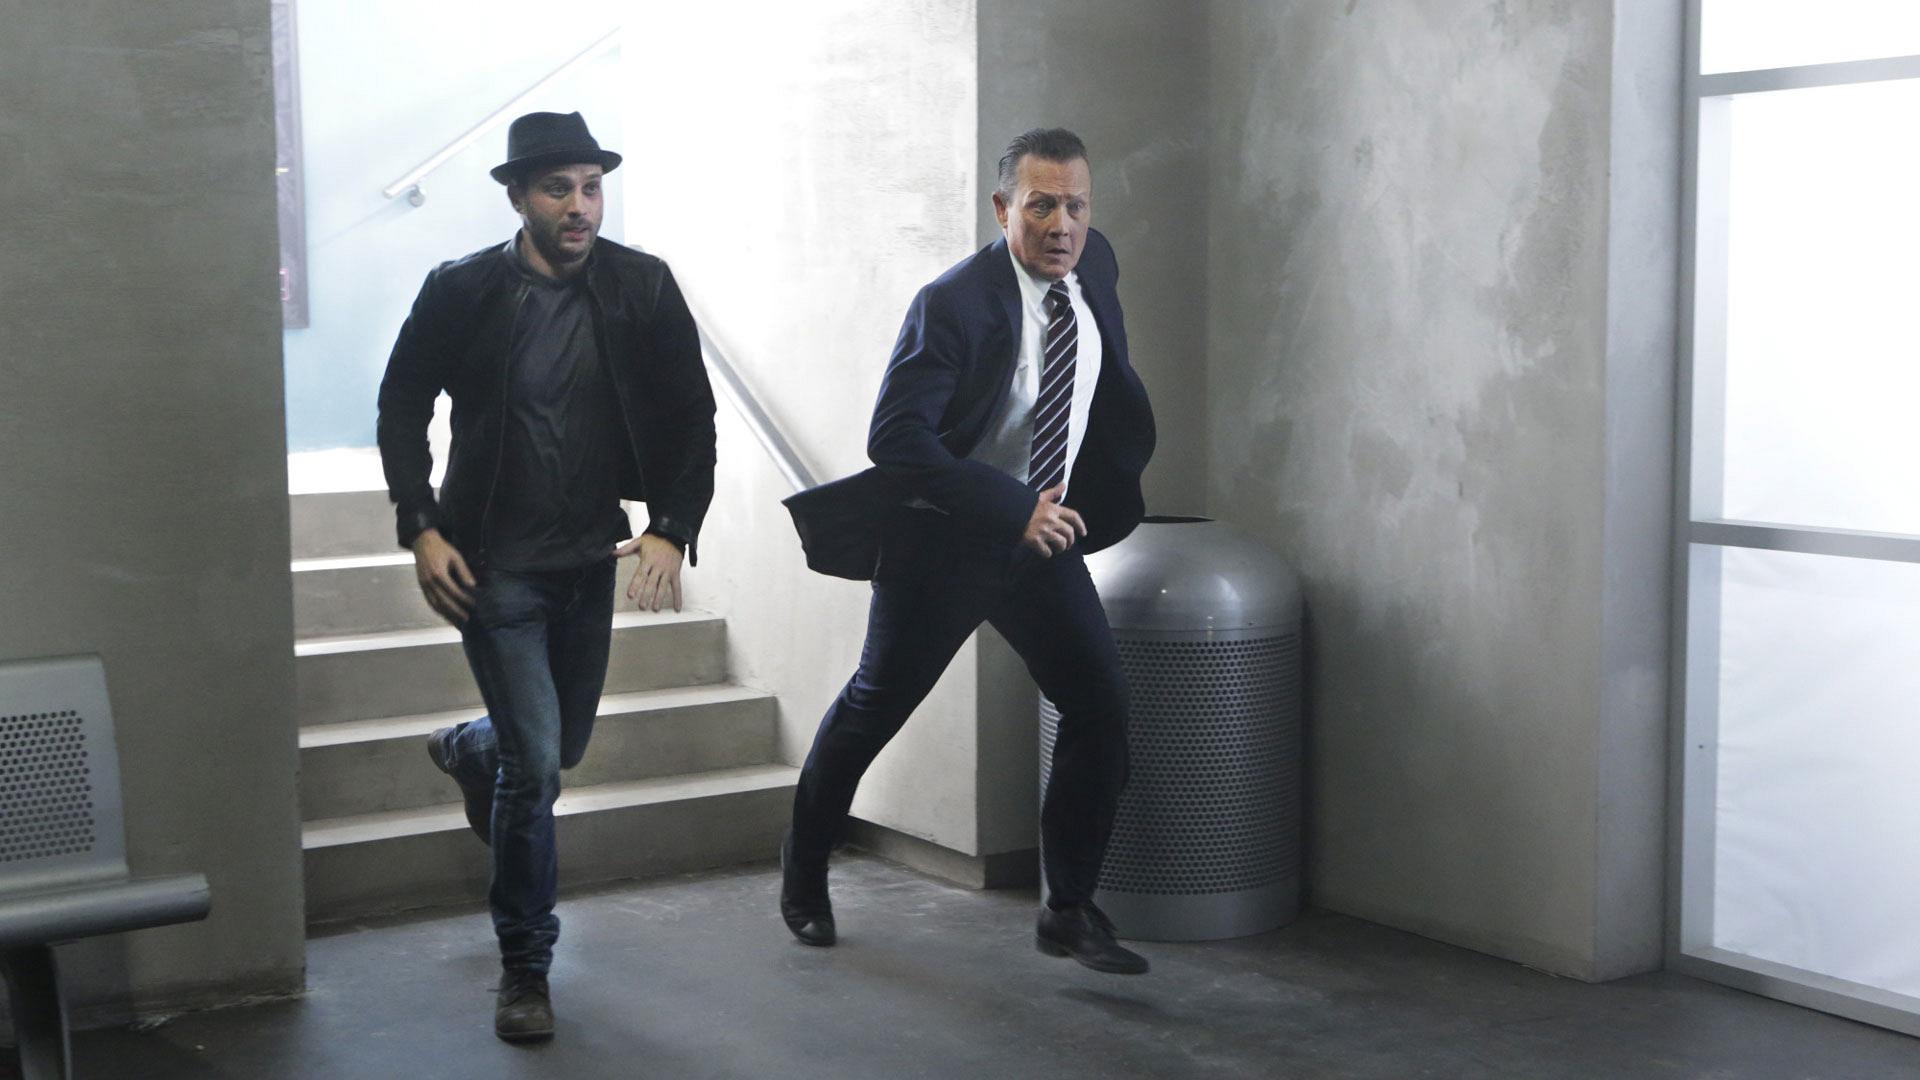 Eddie Kaye Thomas as Toby Curtis and Robert Patrick as Agent Cabe Gallo